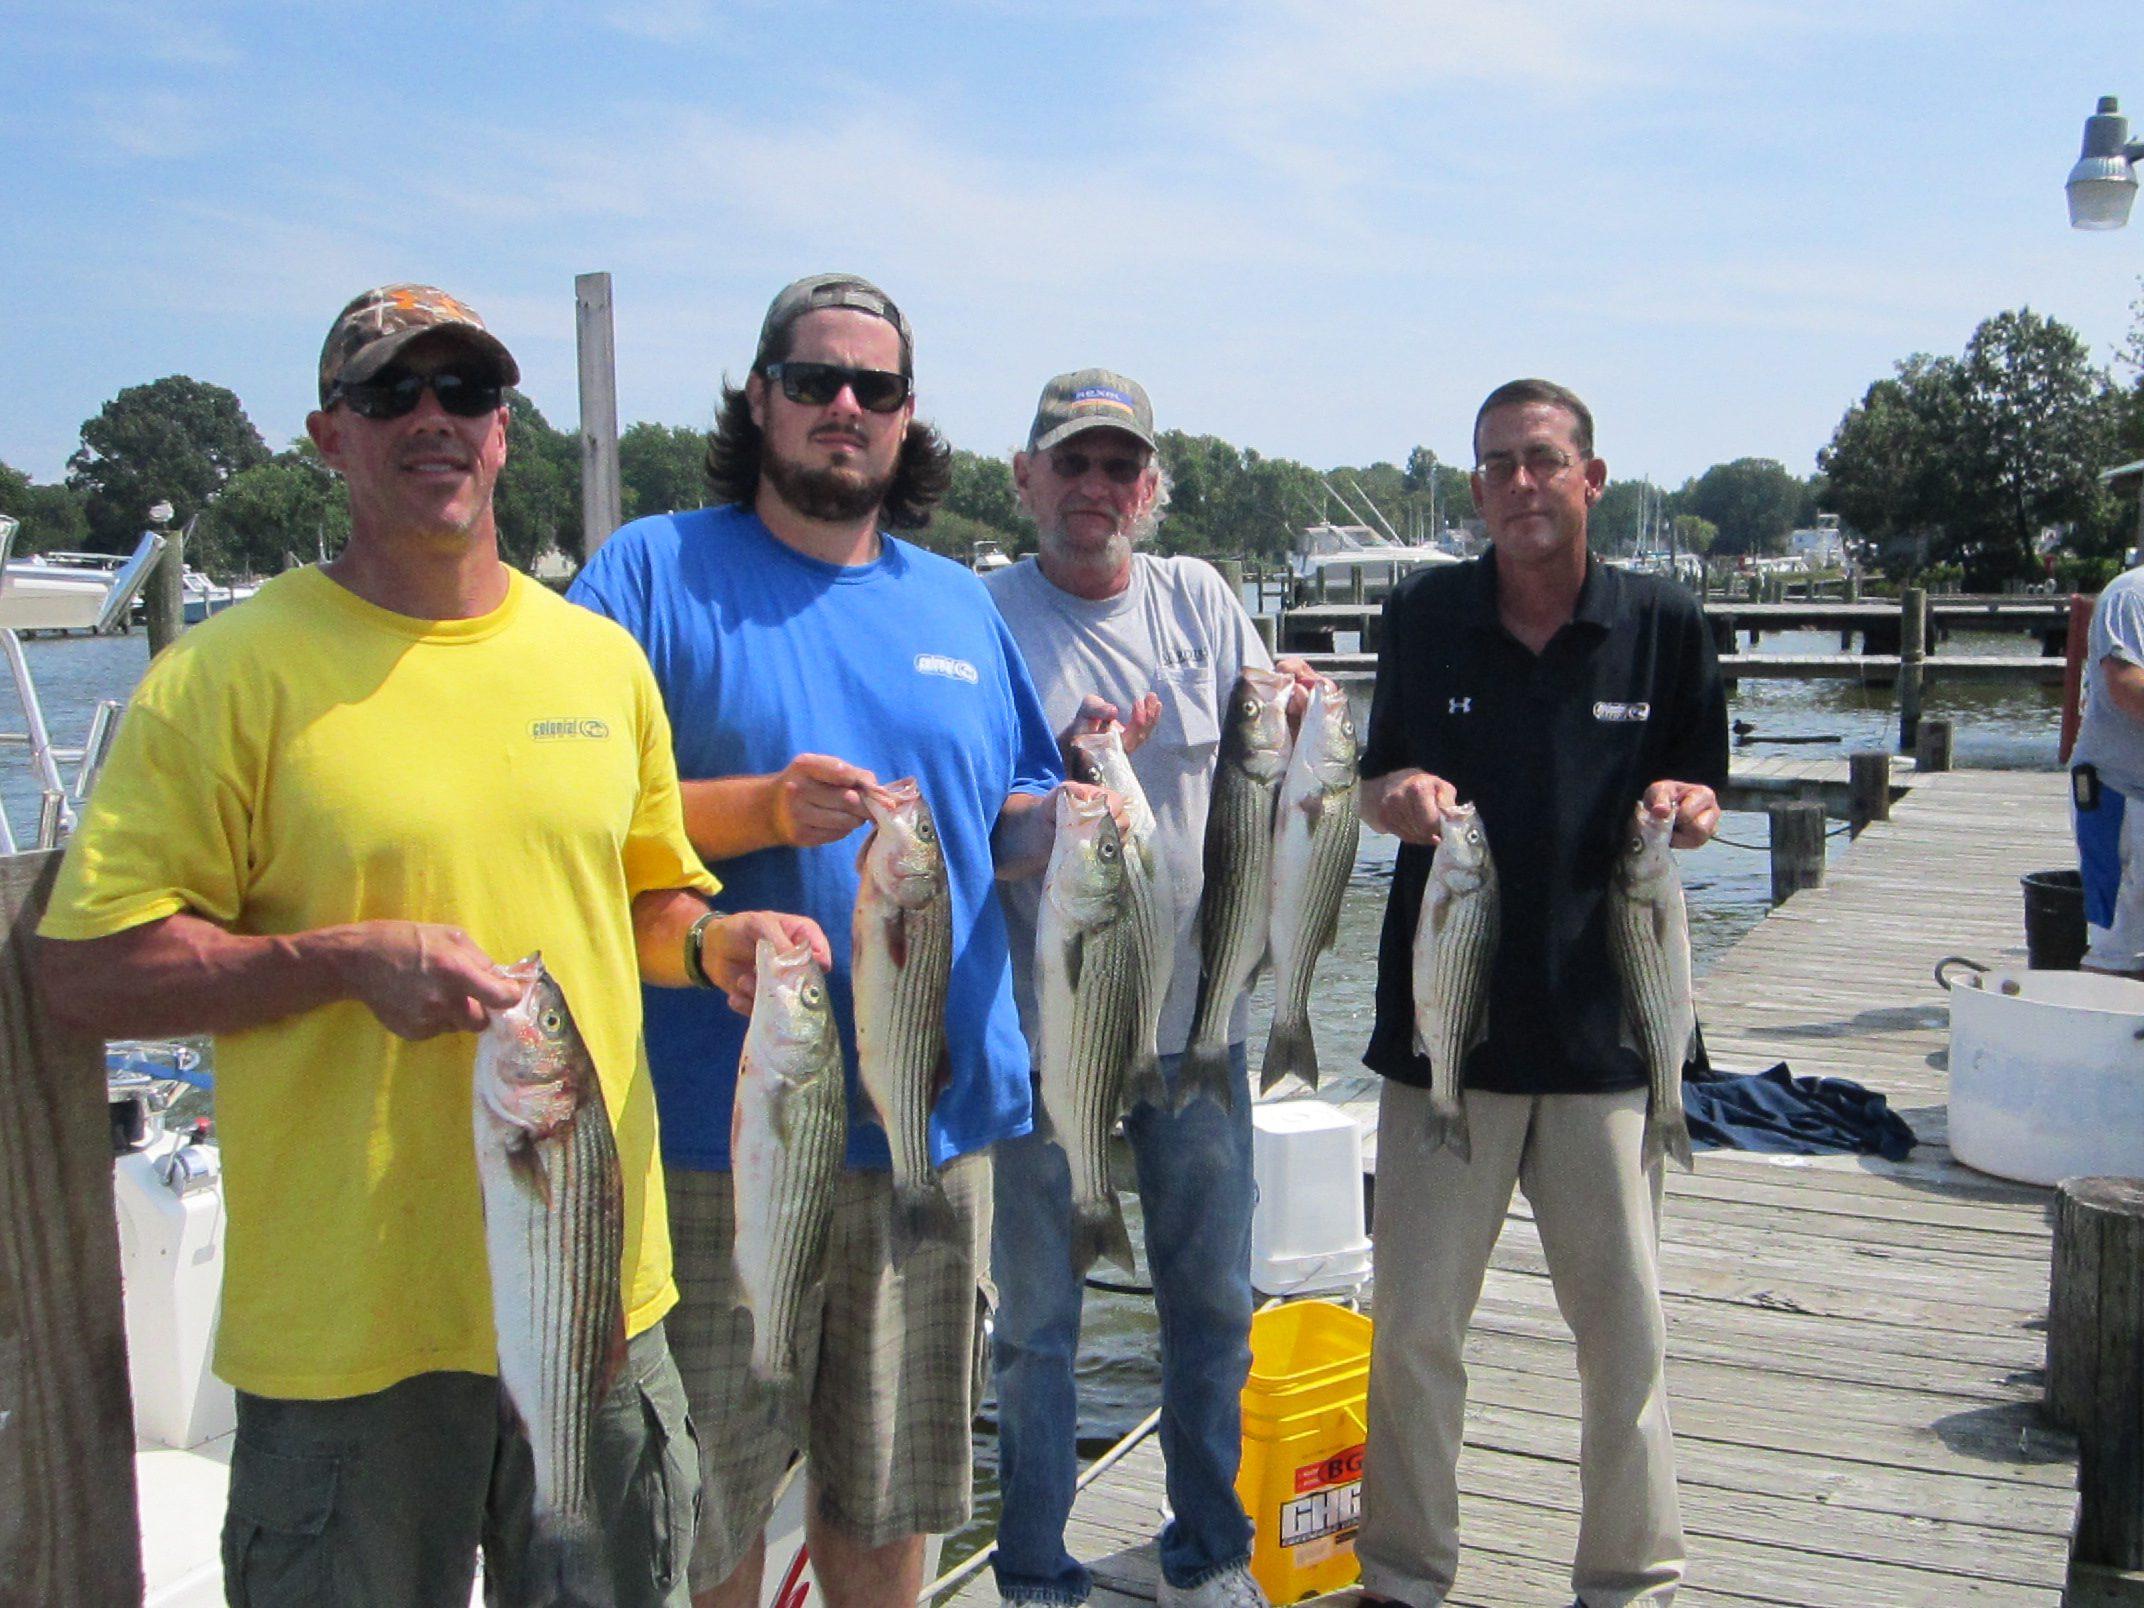 Chesapeake bay fishing report last hurrah charter fishing for Fishing spots in virginia beach